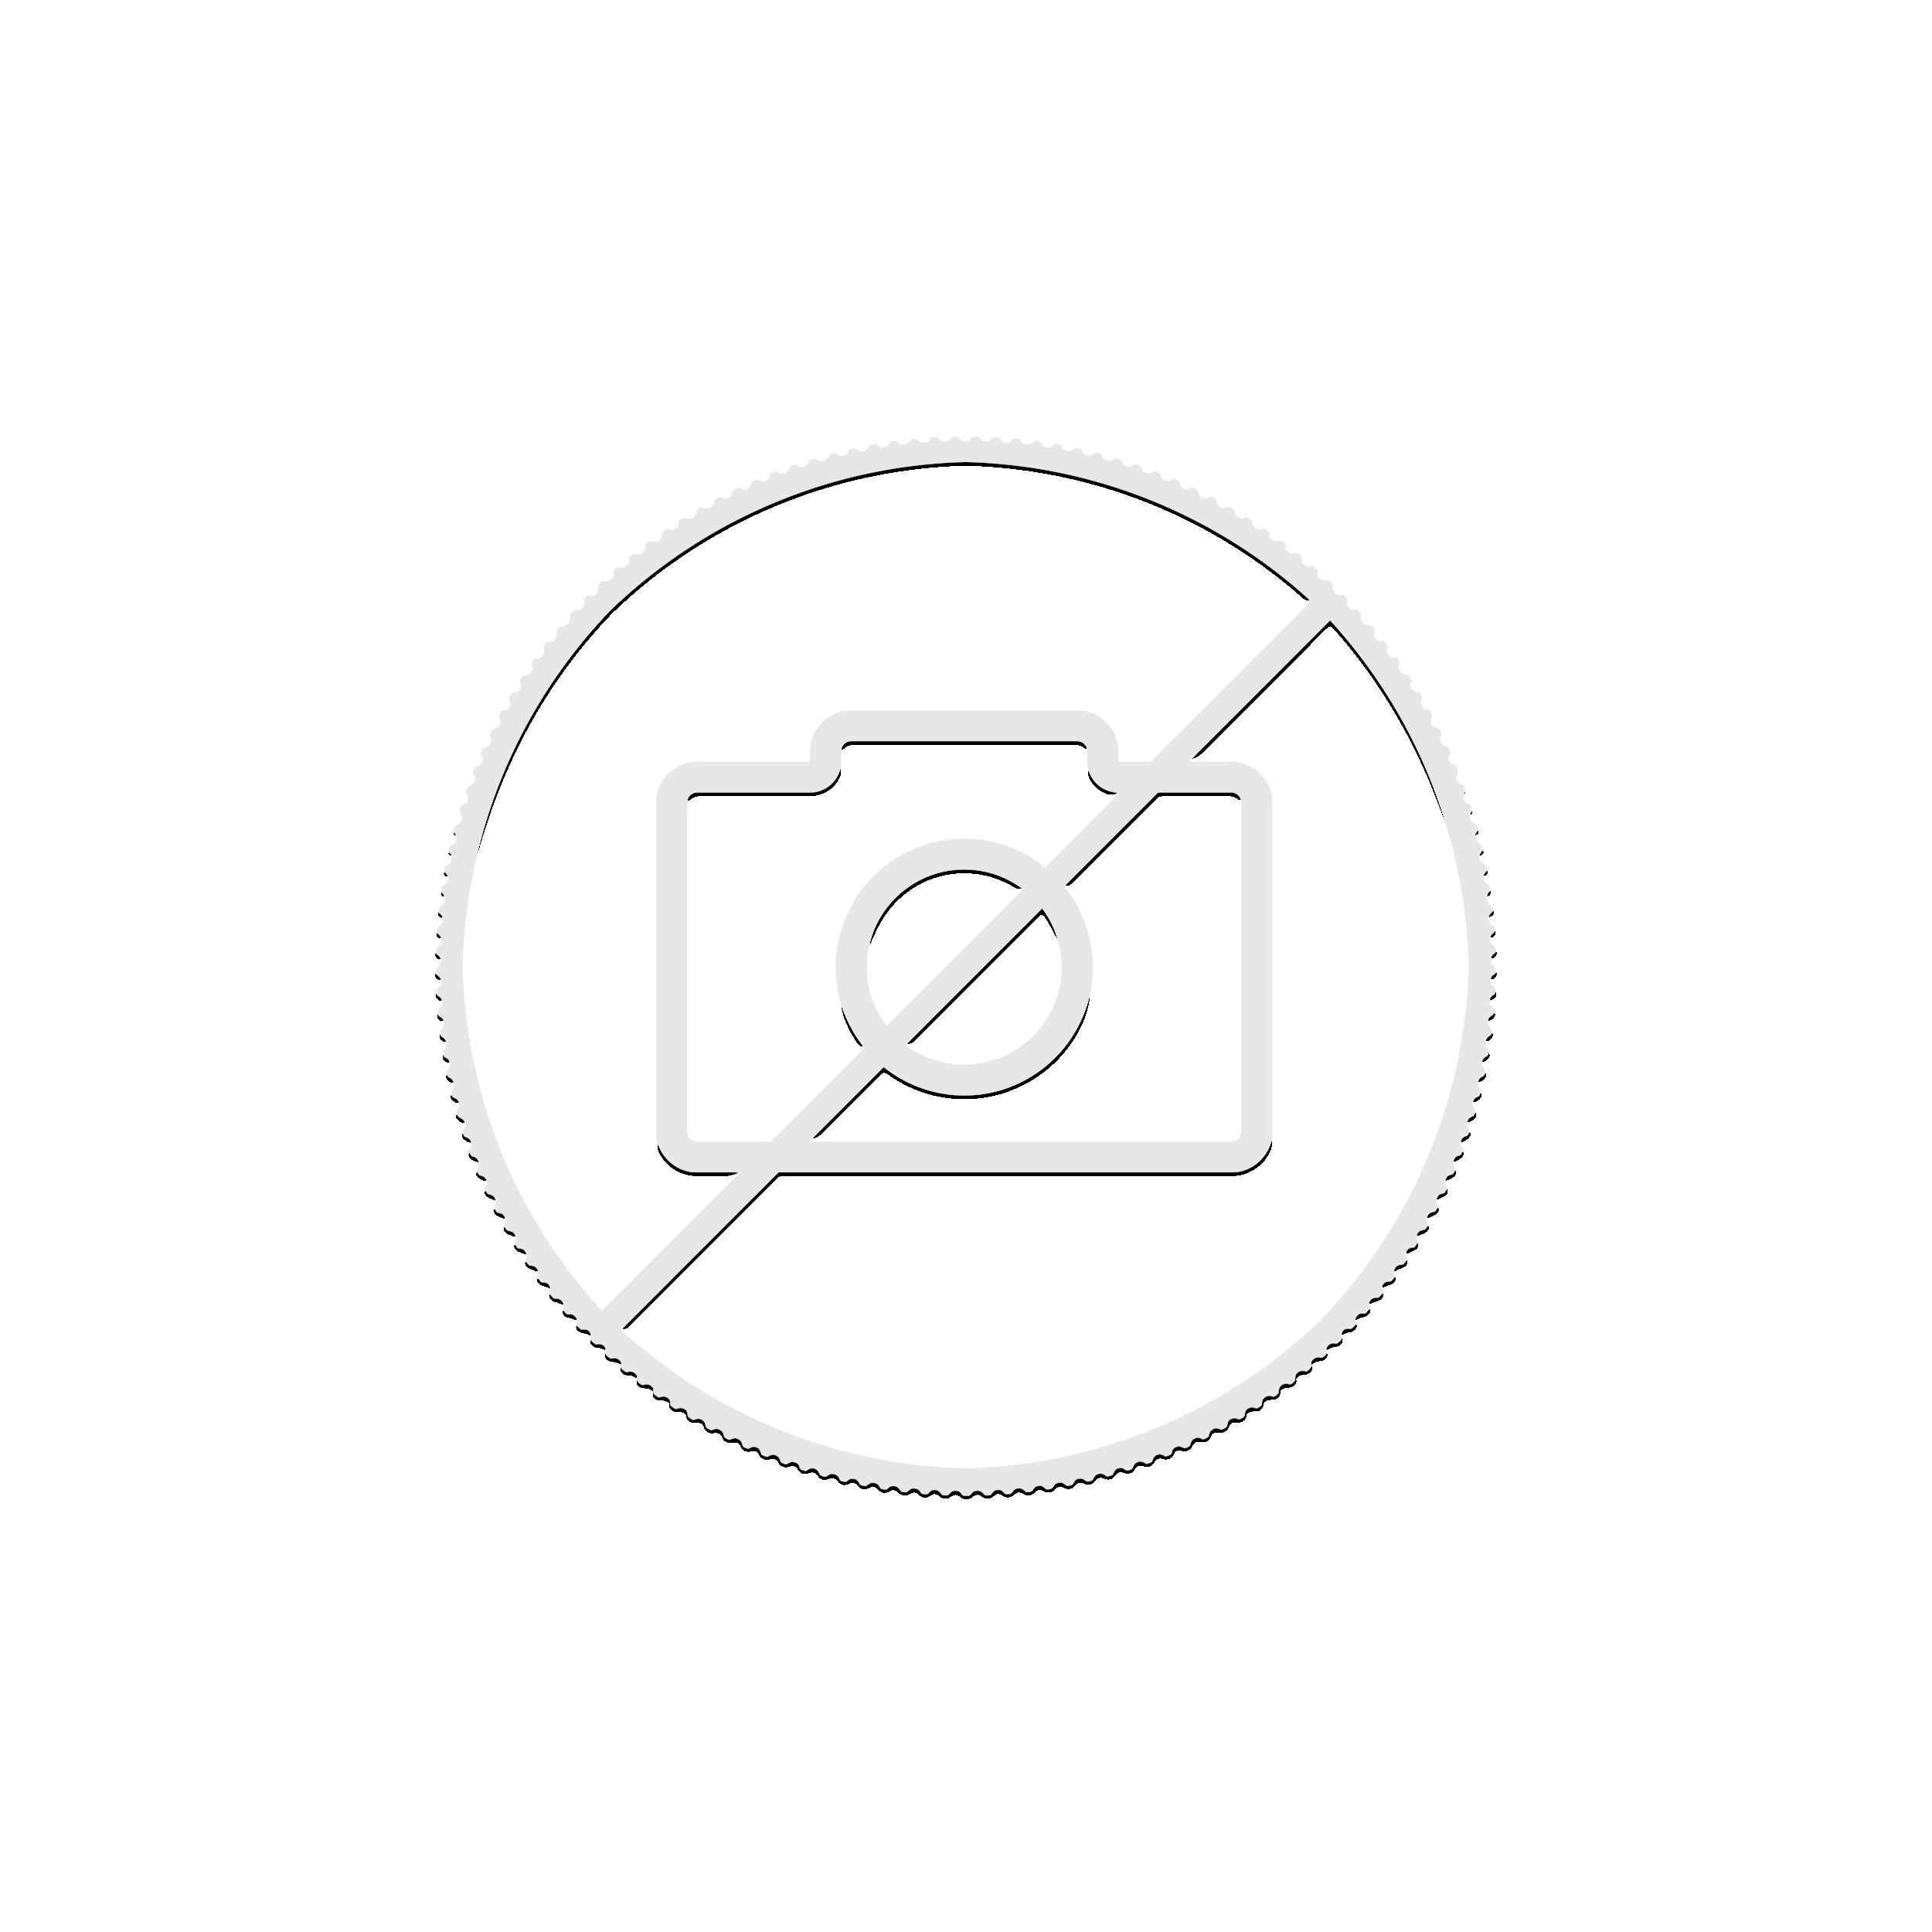 Gold bar 20 grams C. Hafner